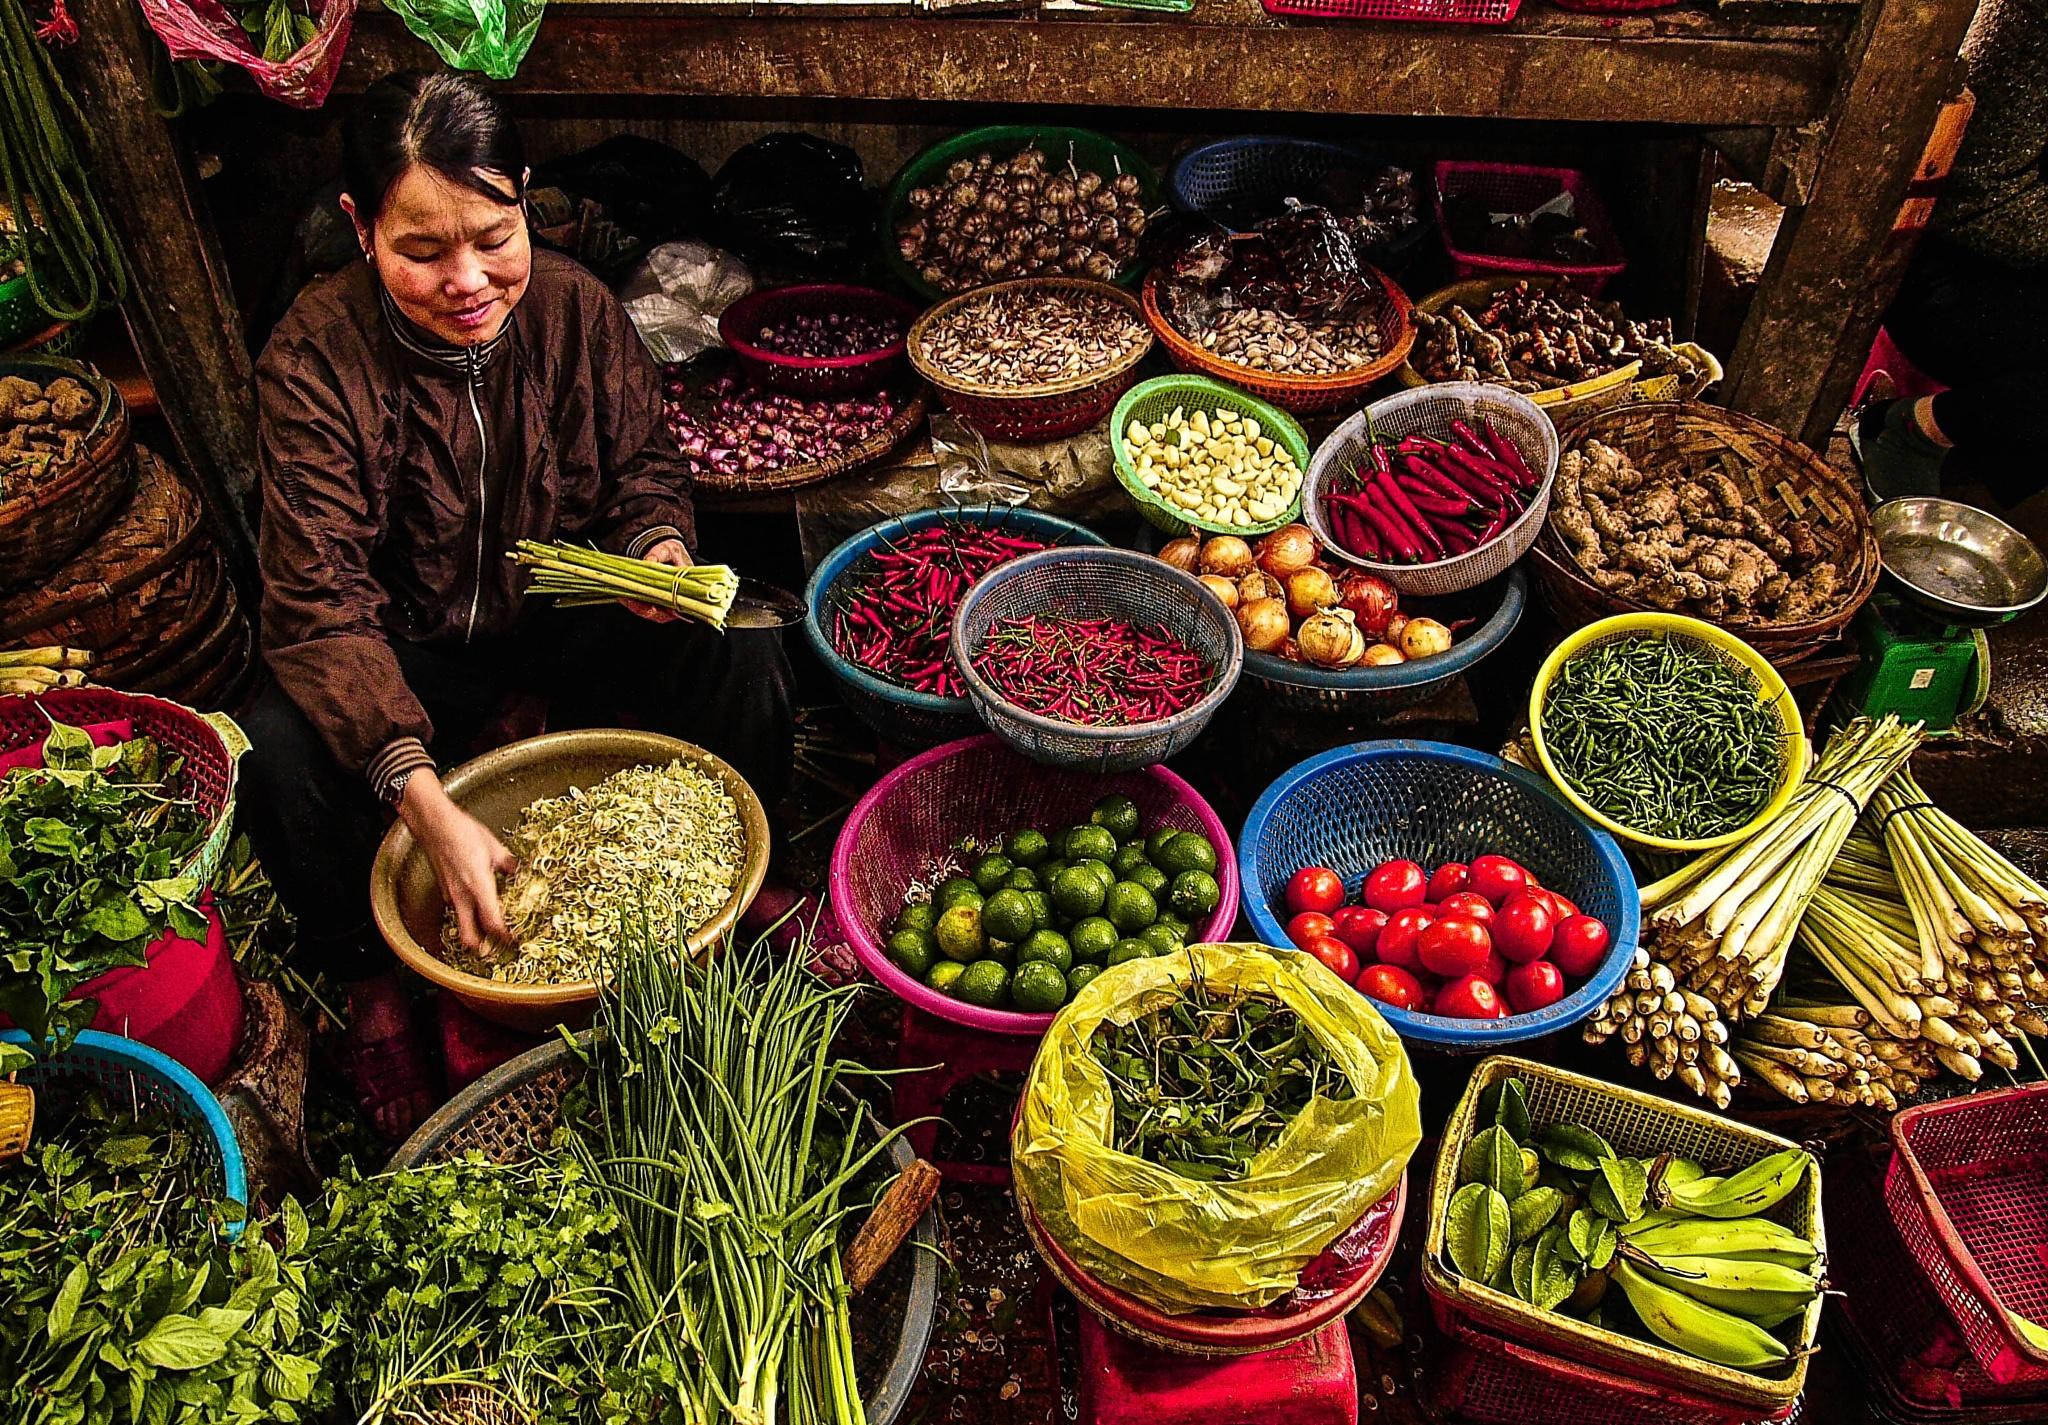 Healthy Options, Dalat, Vietnam by JohnMilligan